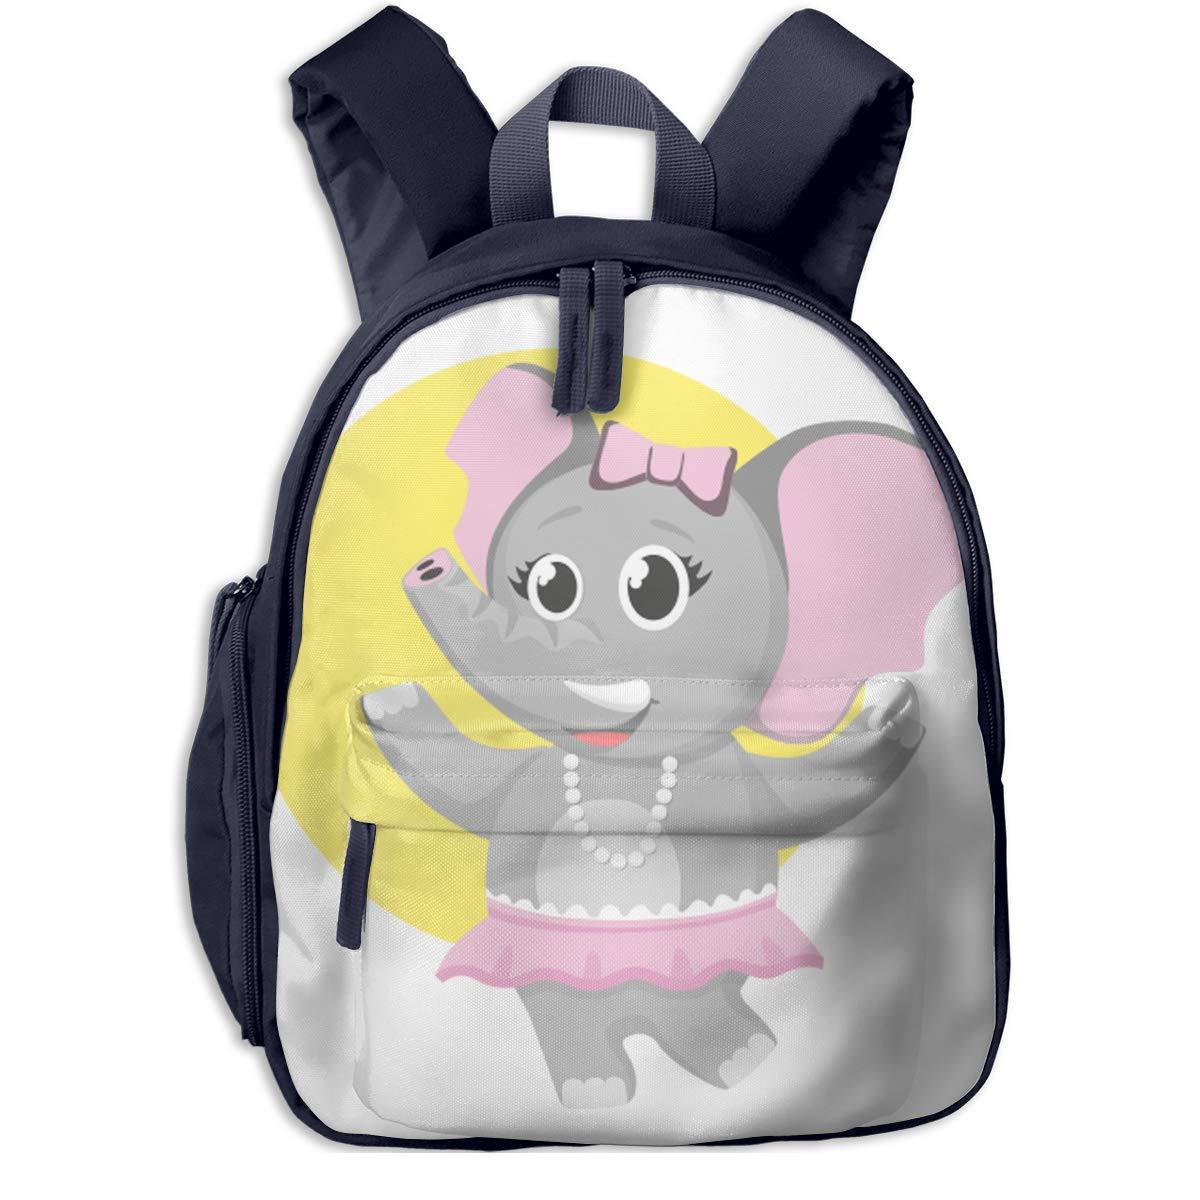 School Backpack for Girls Boys, Kids Cute Elephant Elephant Elephant Cartoon Backpacks Book Bag B07MNQDQKG Ruckscke Hochwertige Materialien 7ad25a